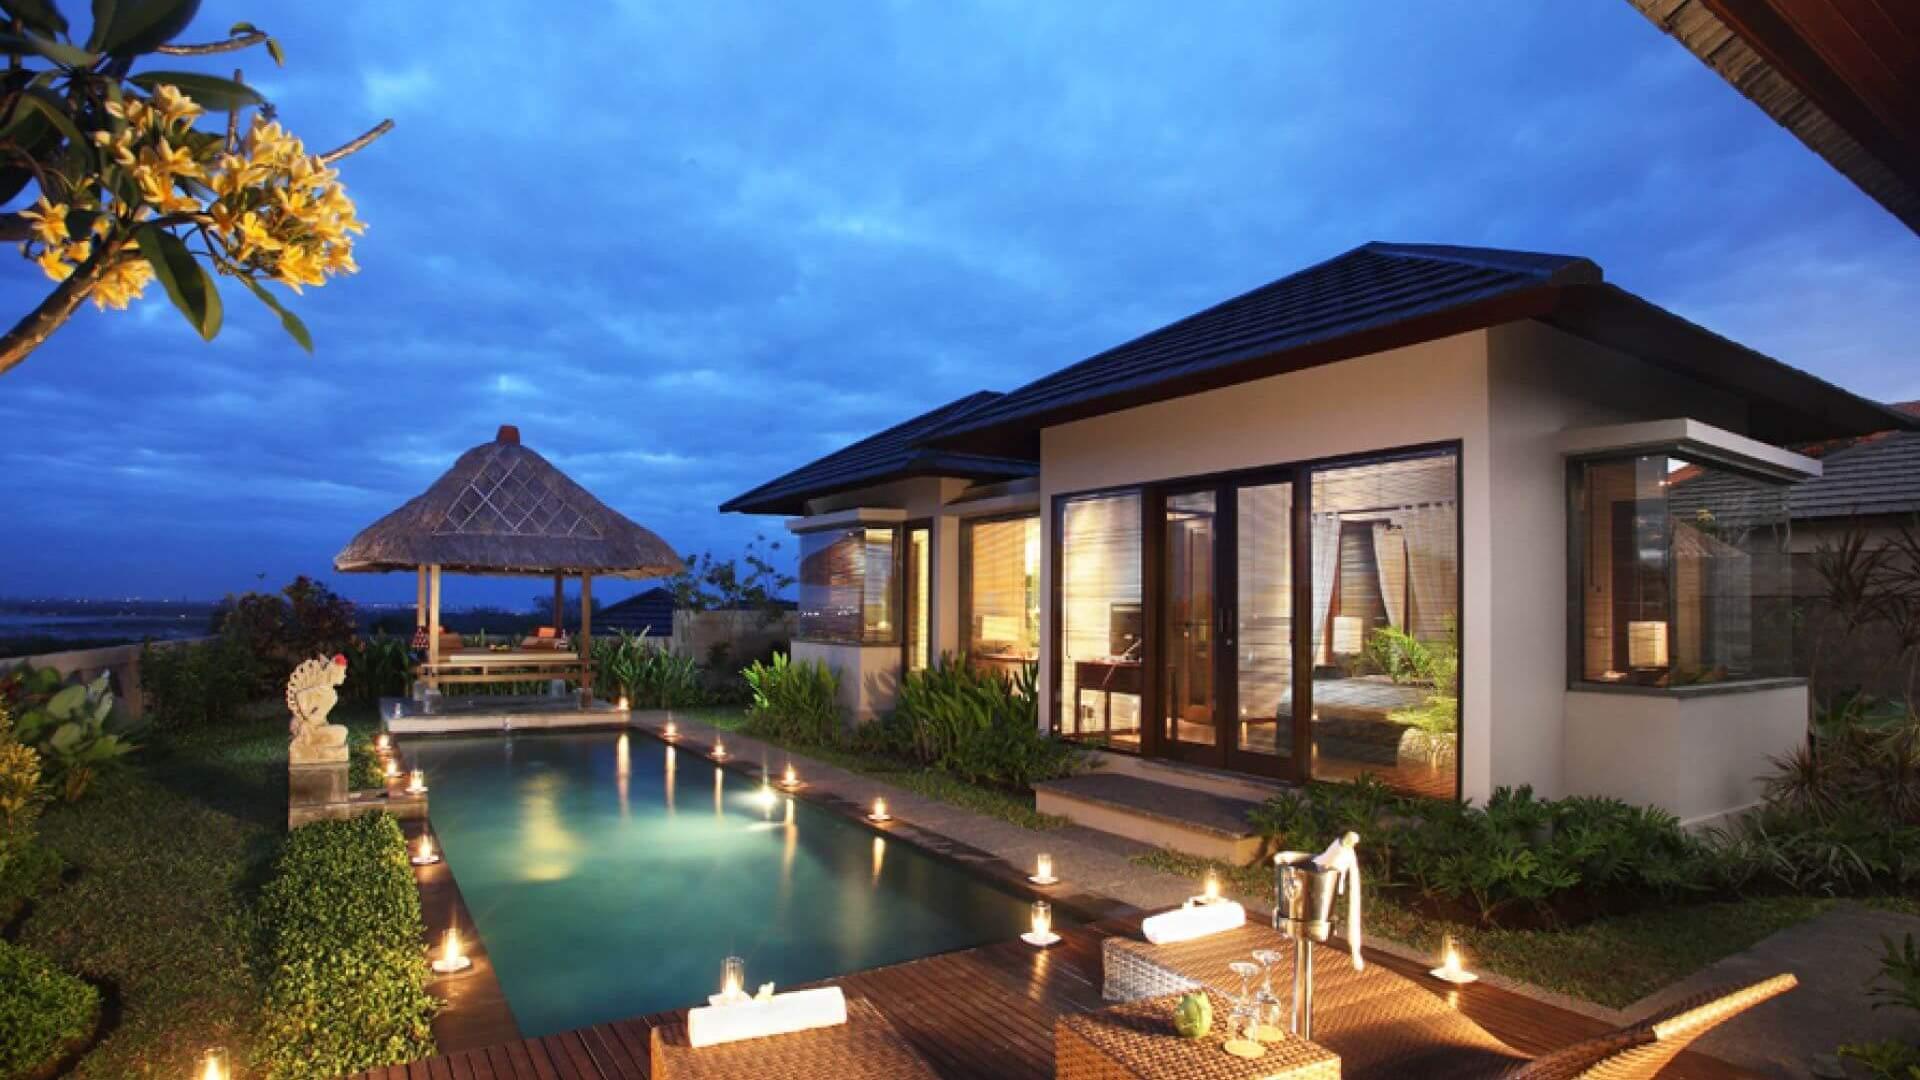 One Bedroom Pool Villa image 1 at Park Hotel Nusa Dua Villas by Kabupaten Badung, Bali, Indonesia